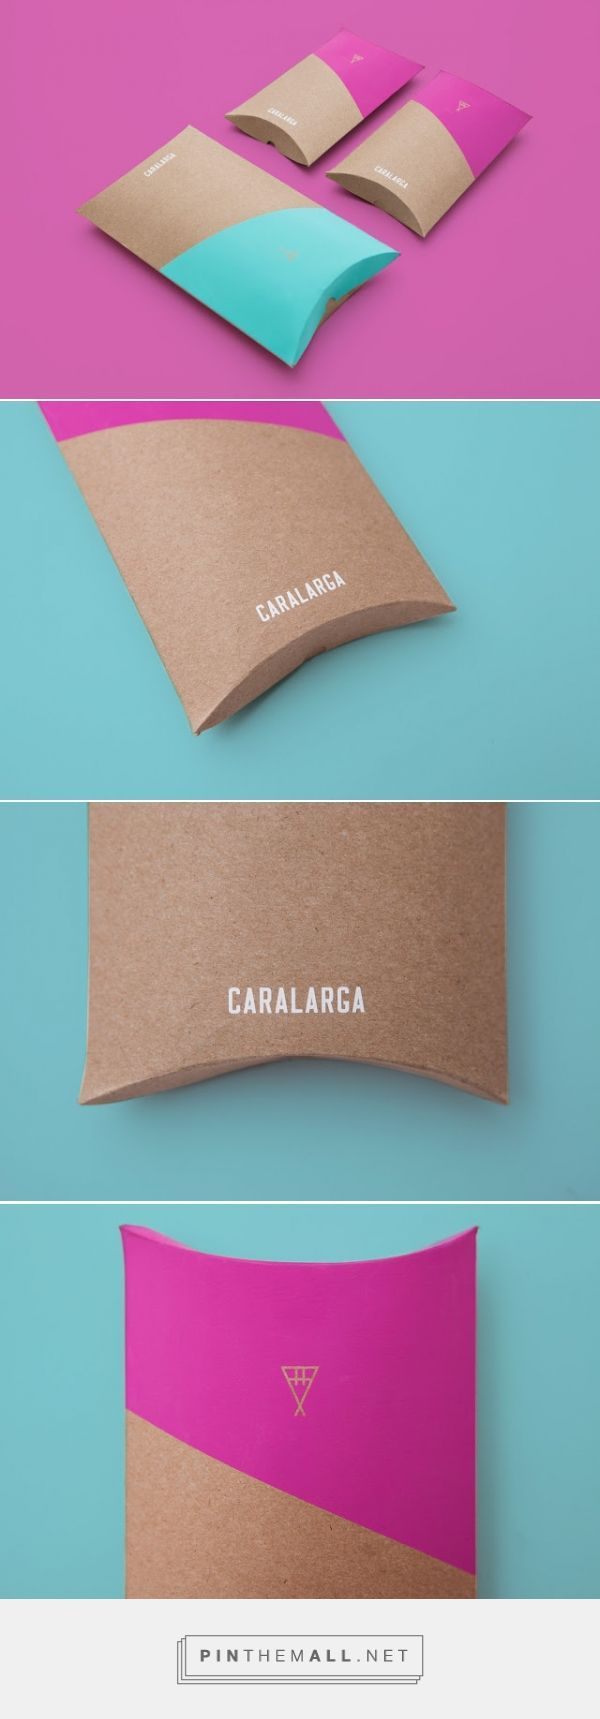 CARALARGA Jewelry Packaging designed by Sociedad Anónima - http://www.packagingoftheworld.com/2015/12/caralarga.html